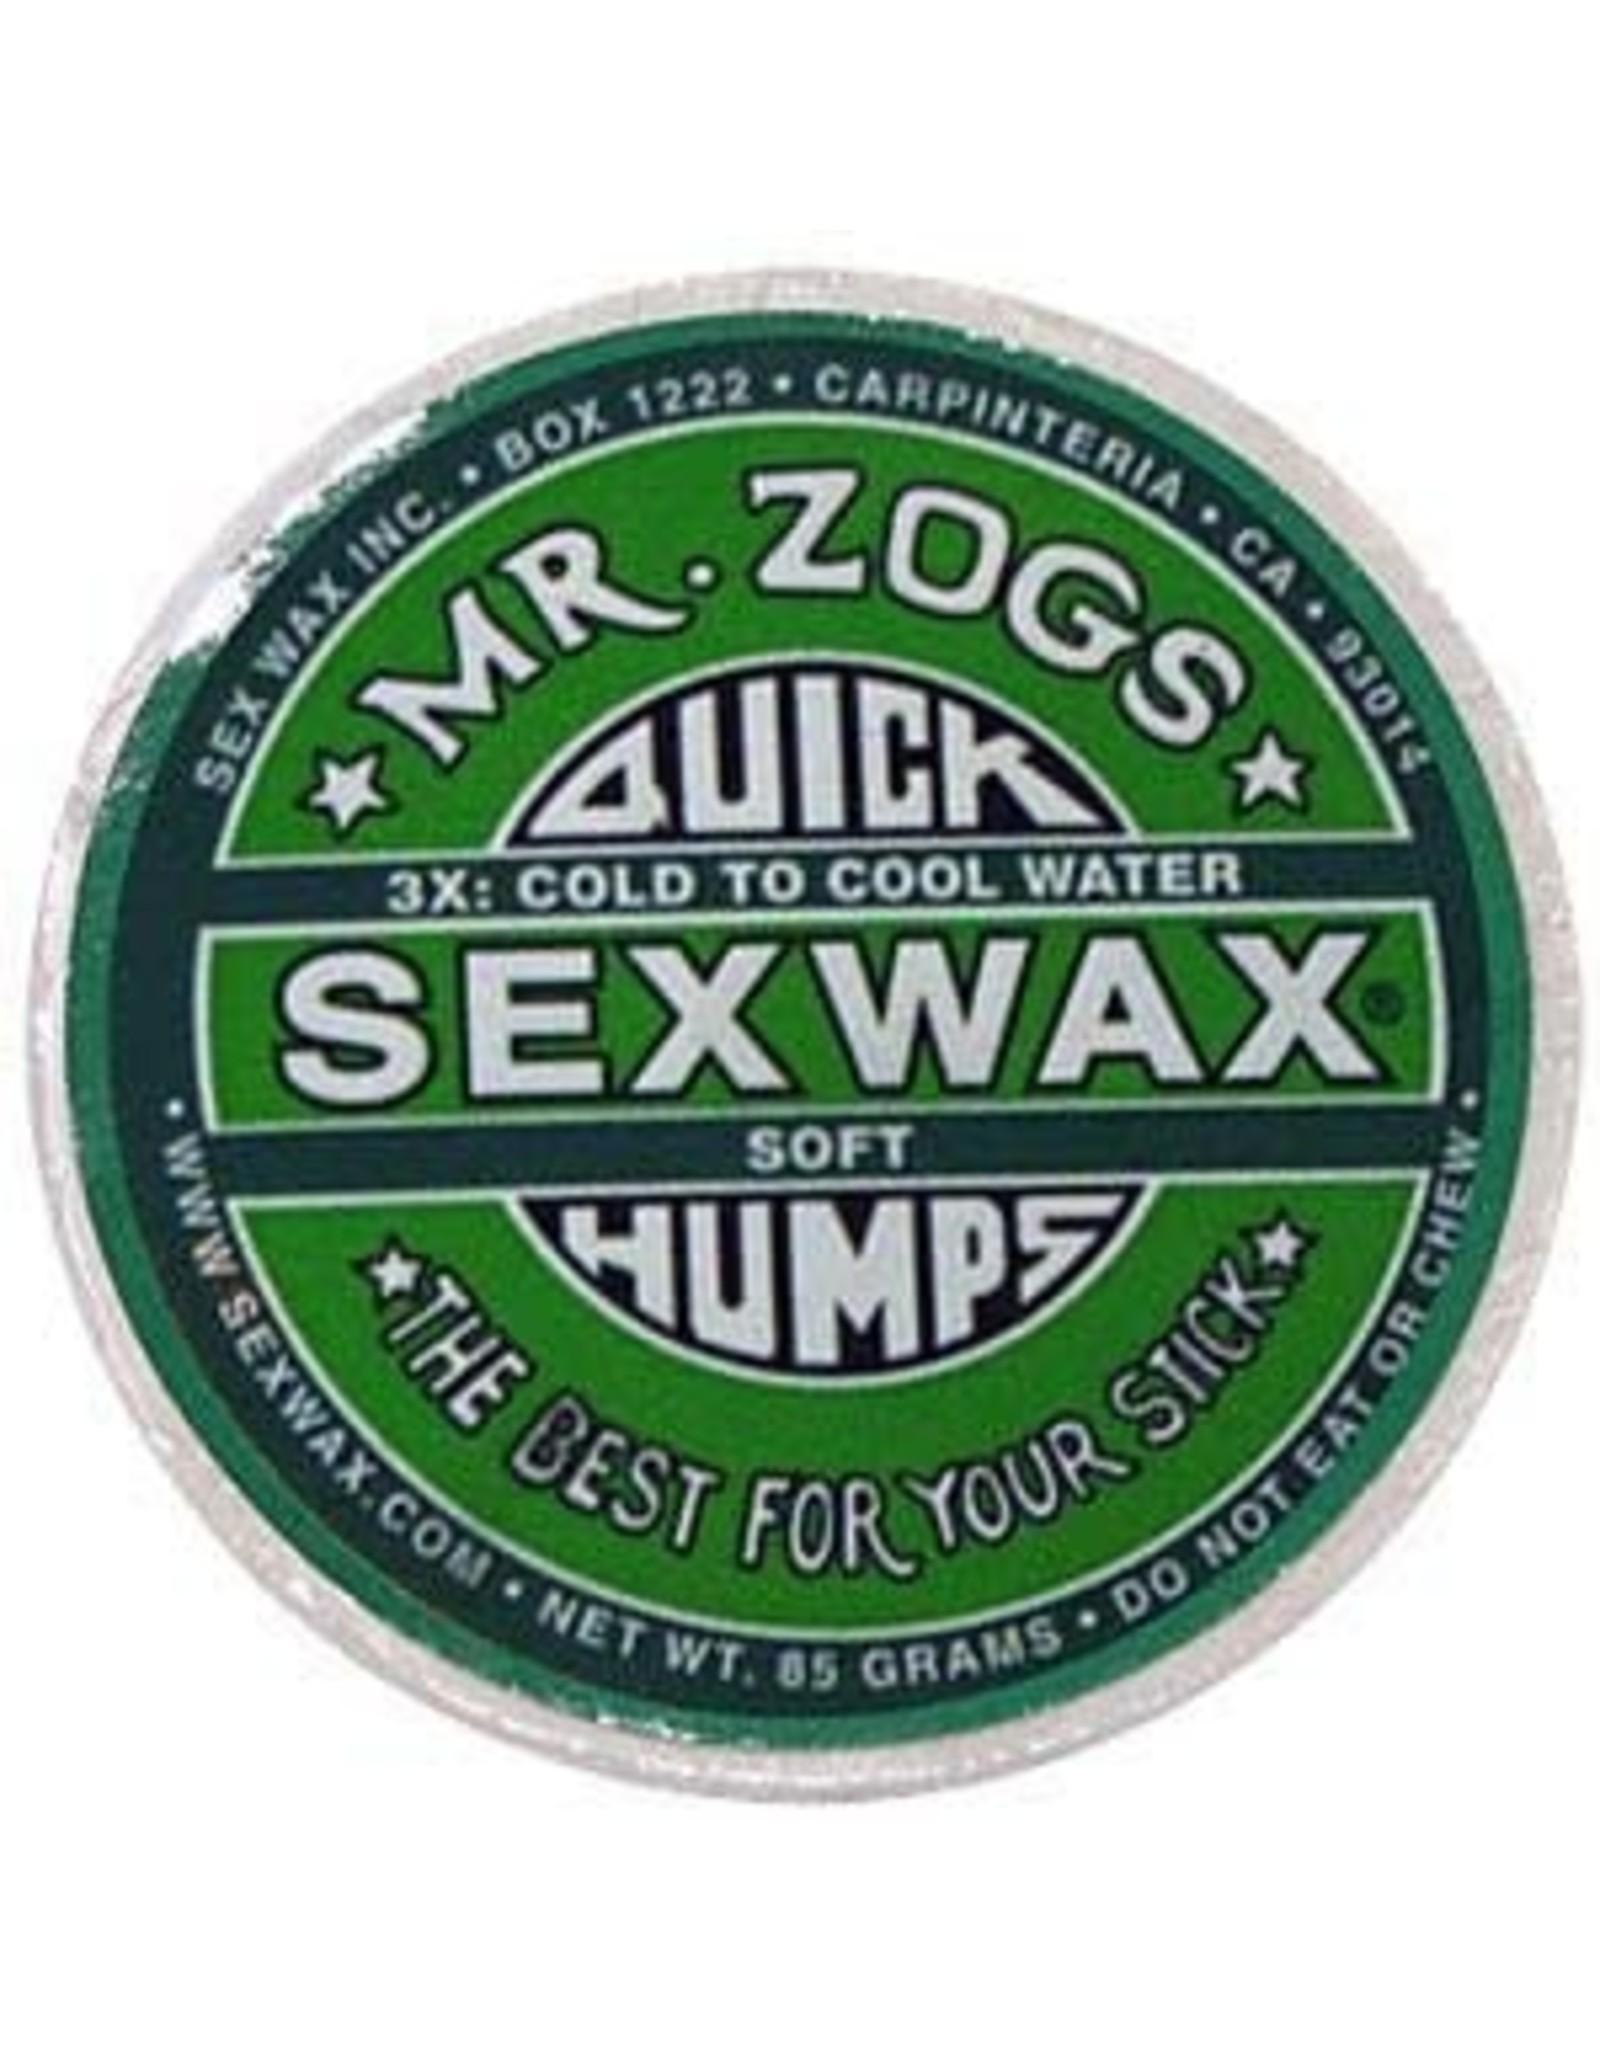 Sex Wax Sex Wax 3x Cool Water 14 - 23C